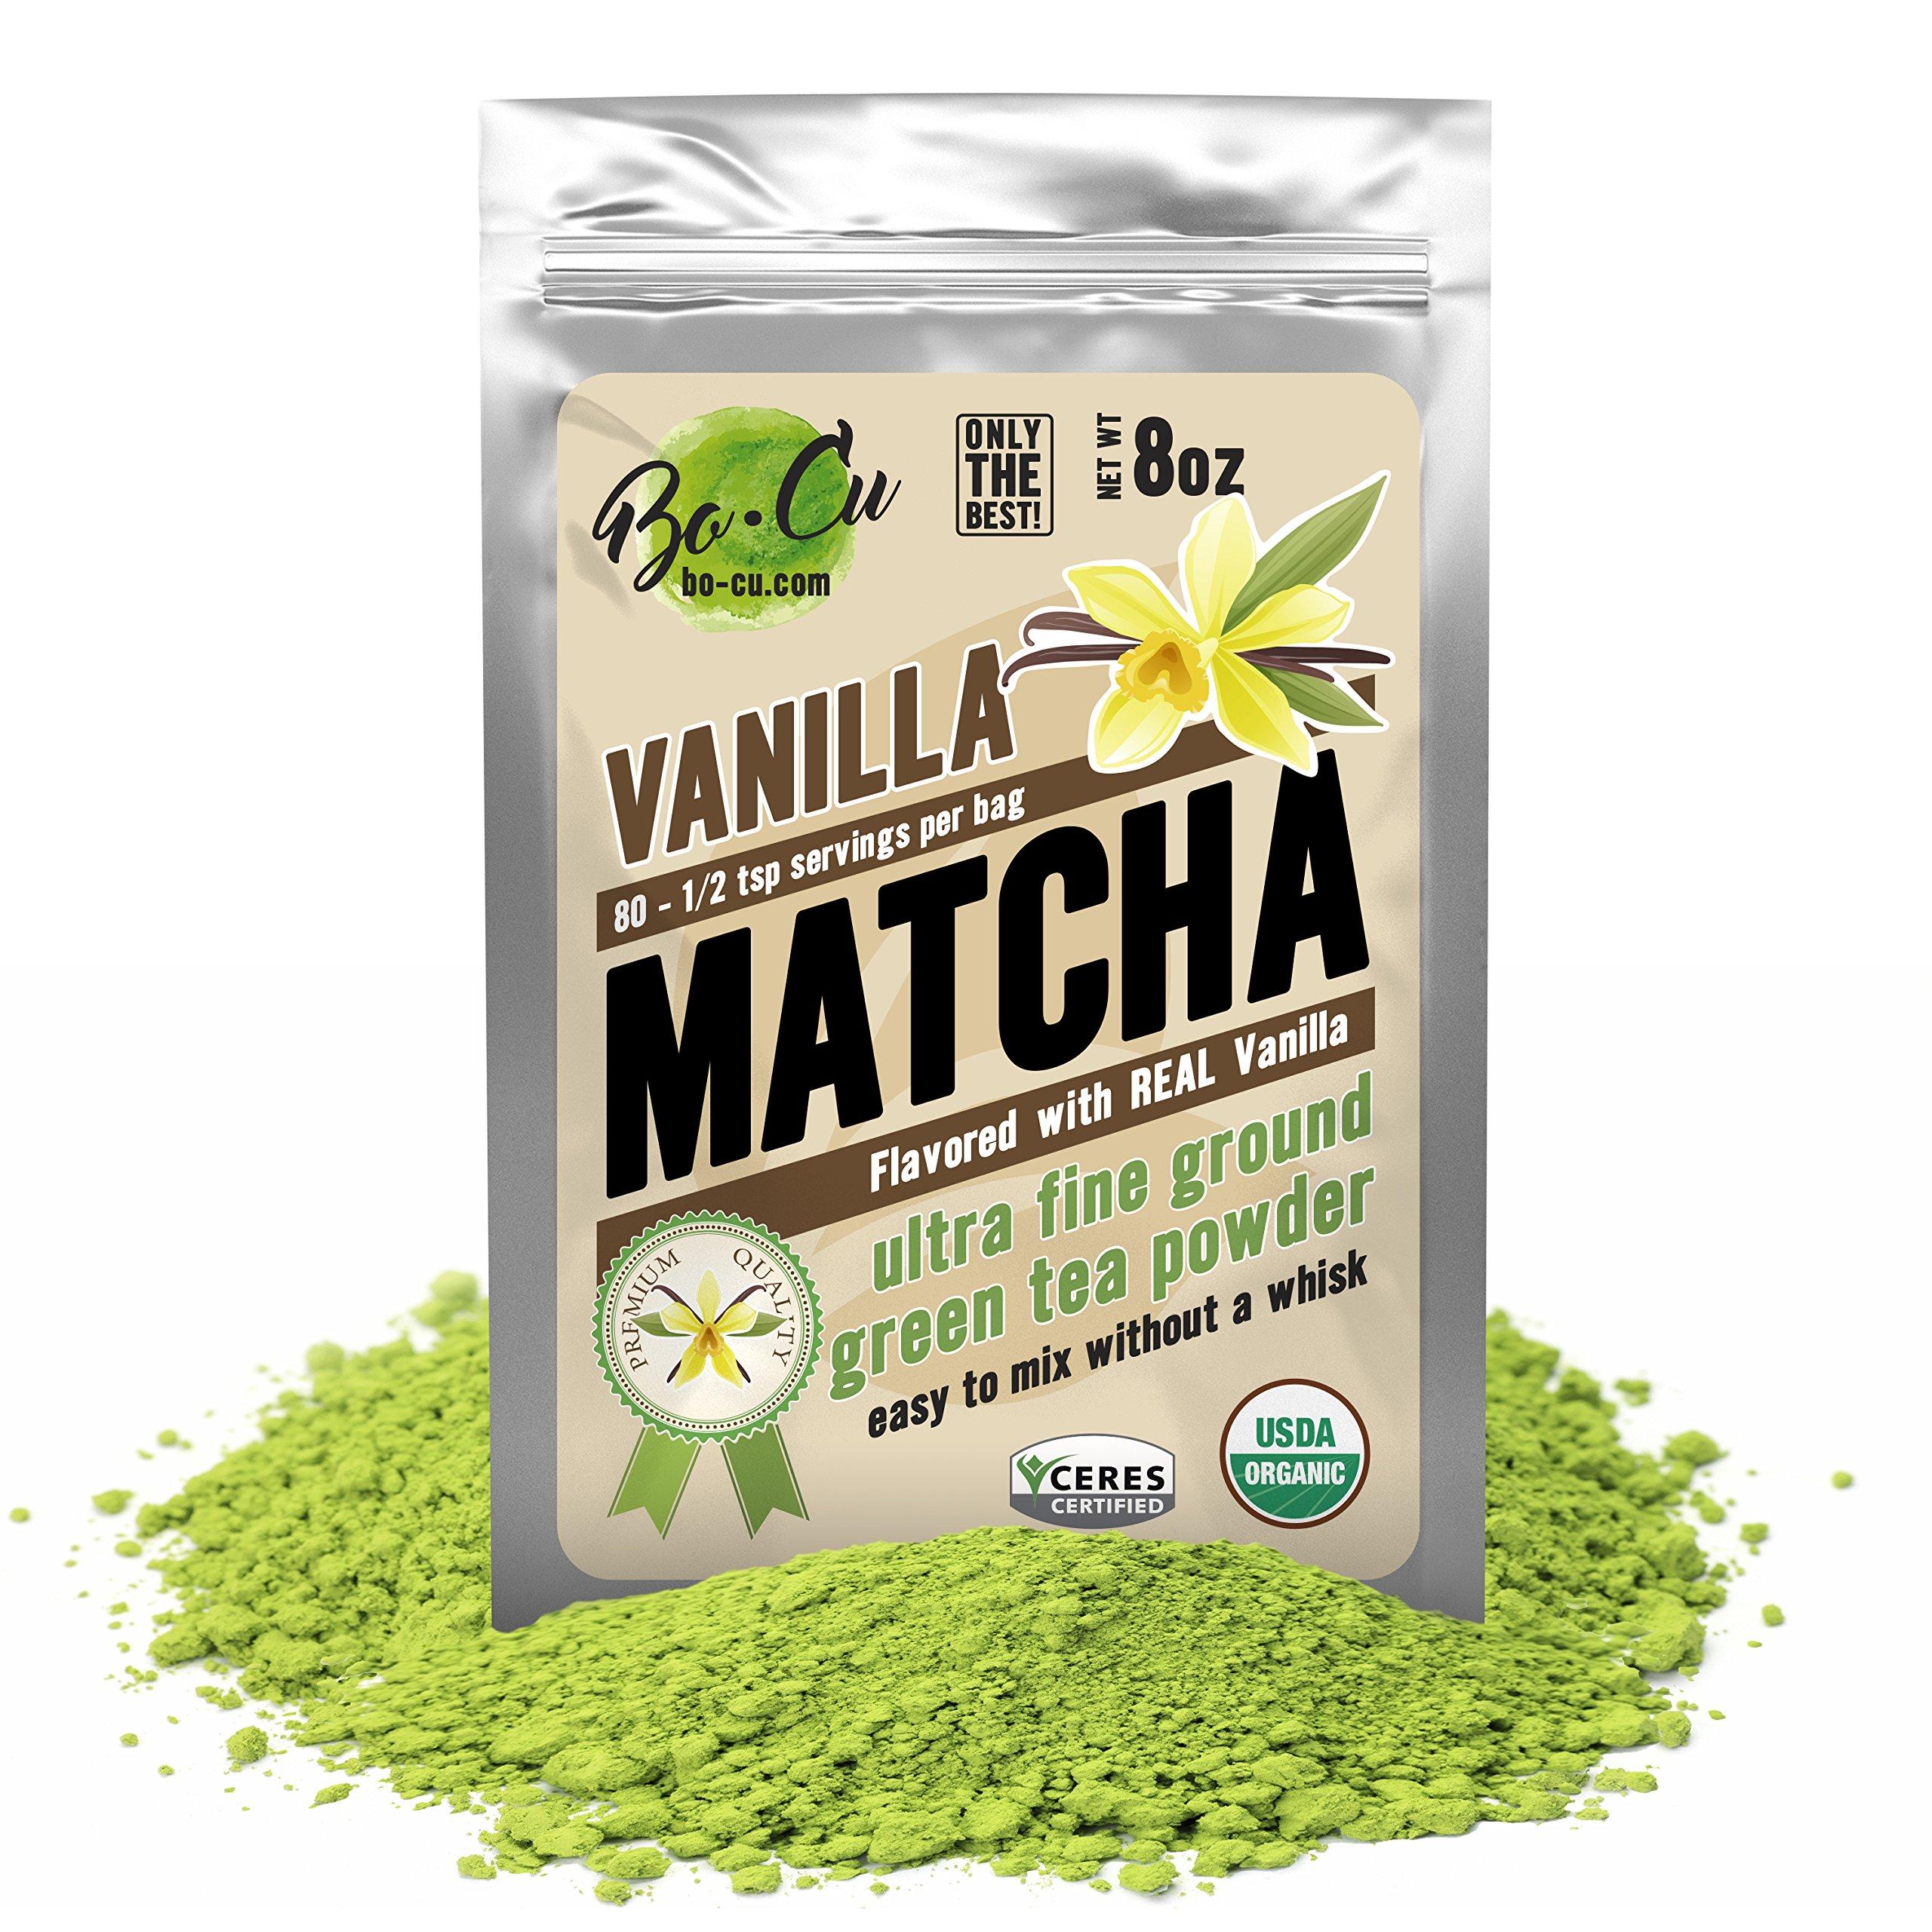 Vanilla Organic Matcha Green Tea Powder - 80 Servings, 8 oz - 2 Ingredients, Natural Flavored Instant Tea for Drinking, Smoothies or Baking, Grade A Matcha